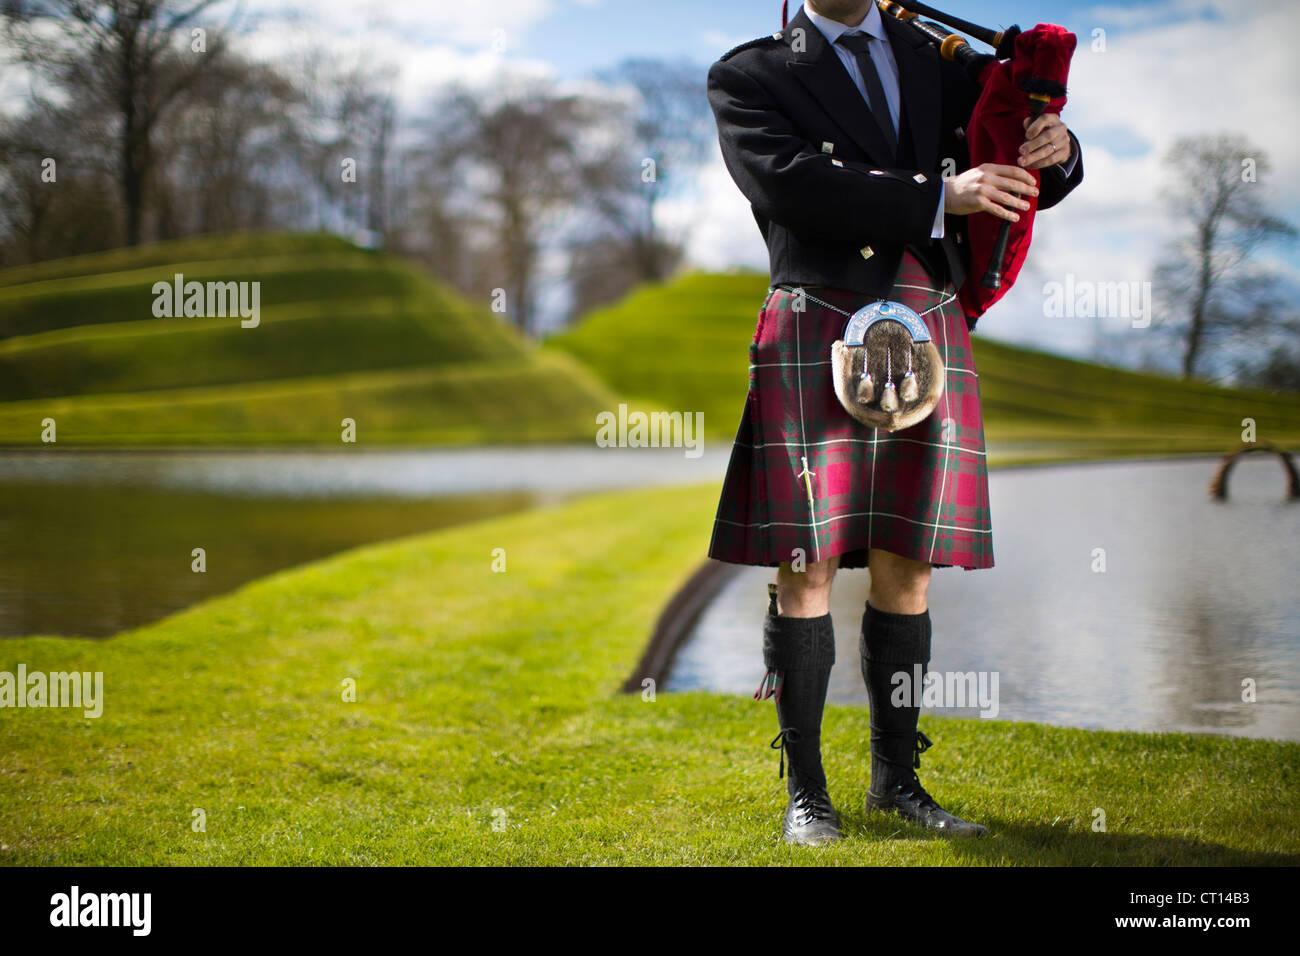 Man in Scottish kilt playing bagpipes - Stock Image